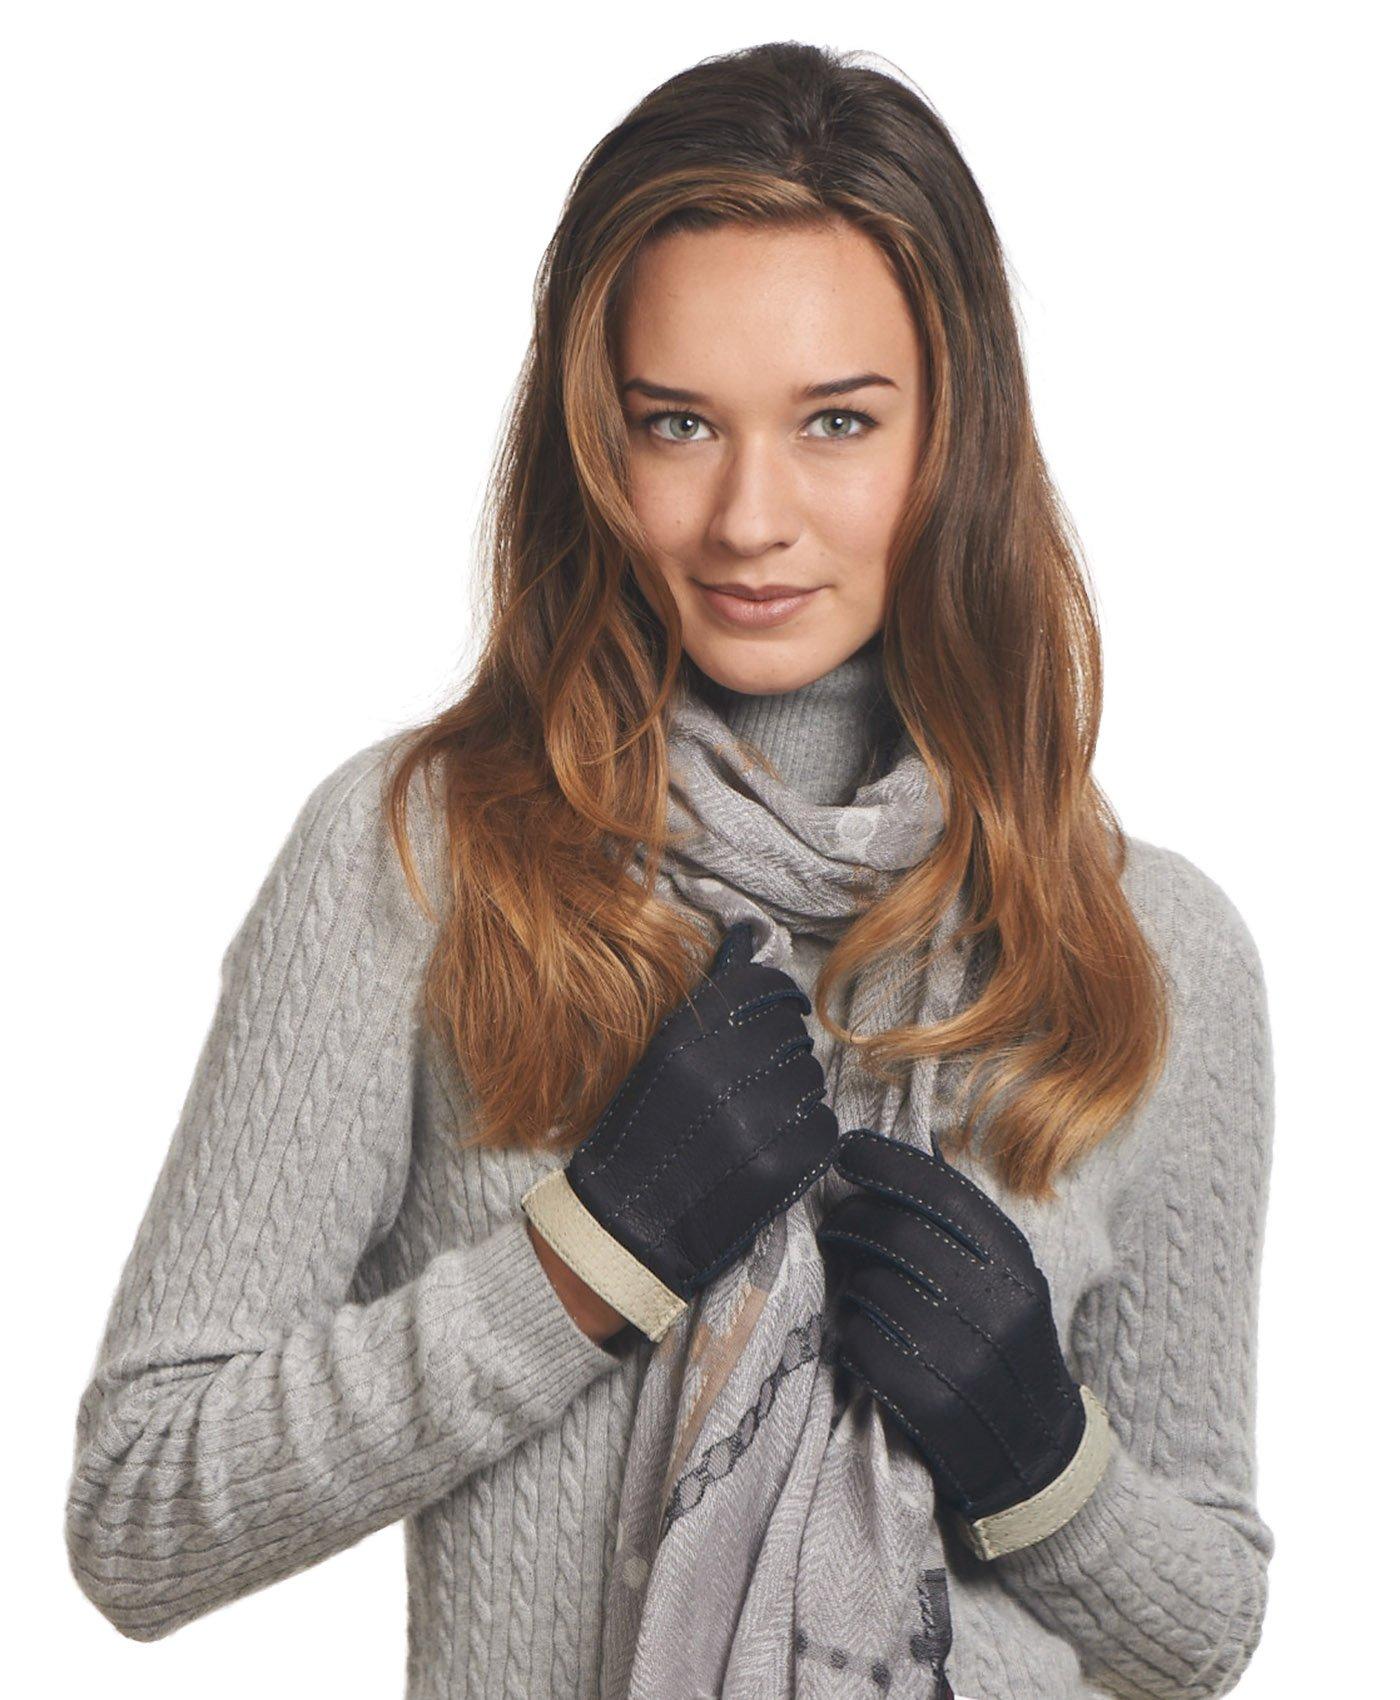 Fratelli Orsini Women's Italian Cashmere Lined Peccary Gloves Size 7 1/2 Color Cork by Fratelli Orsini (Image #6)